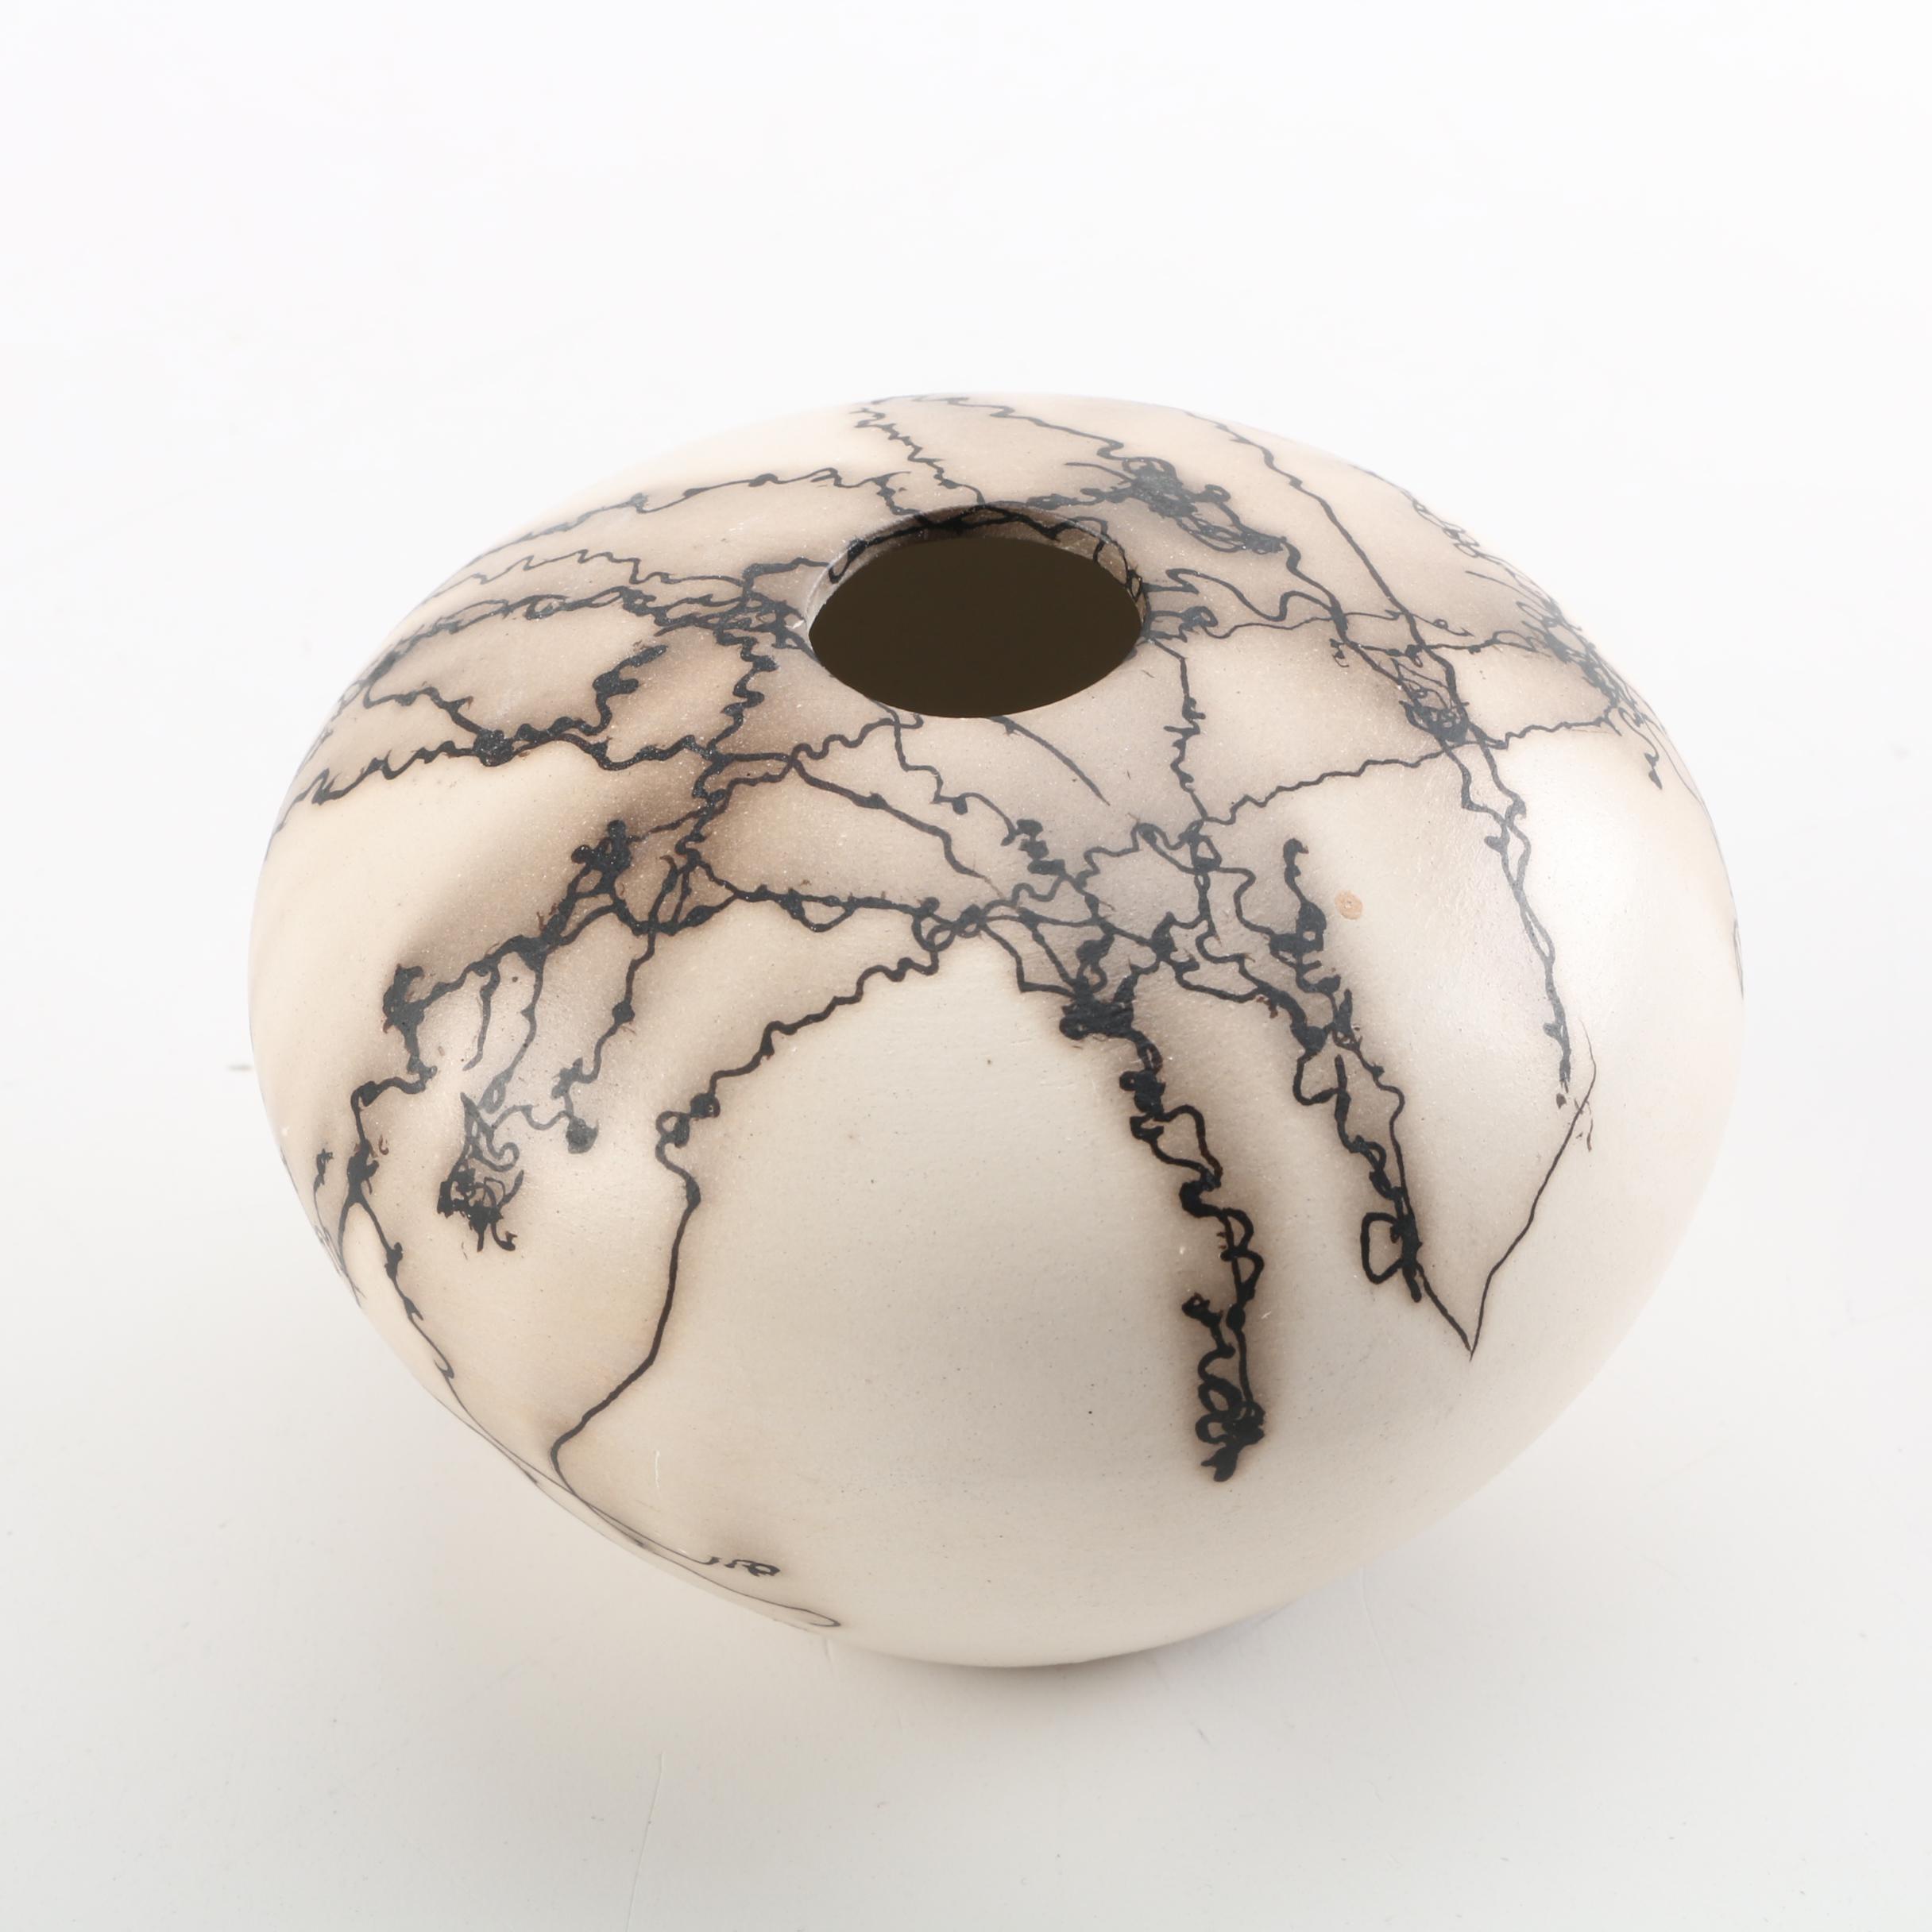 Signed Horsehair Raku Fired Ikebana Orb Vase